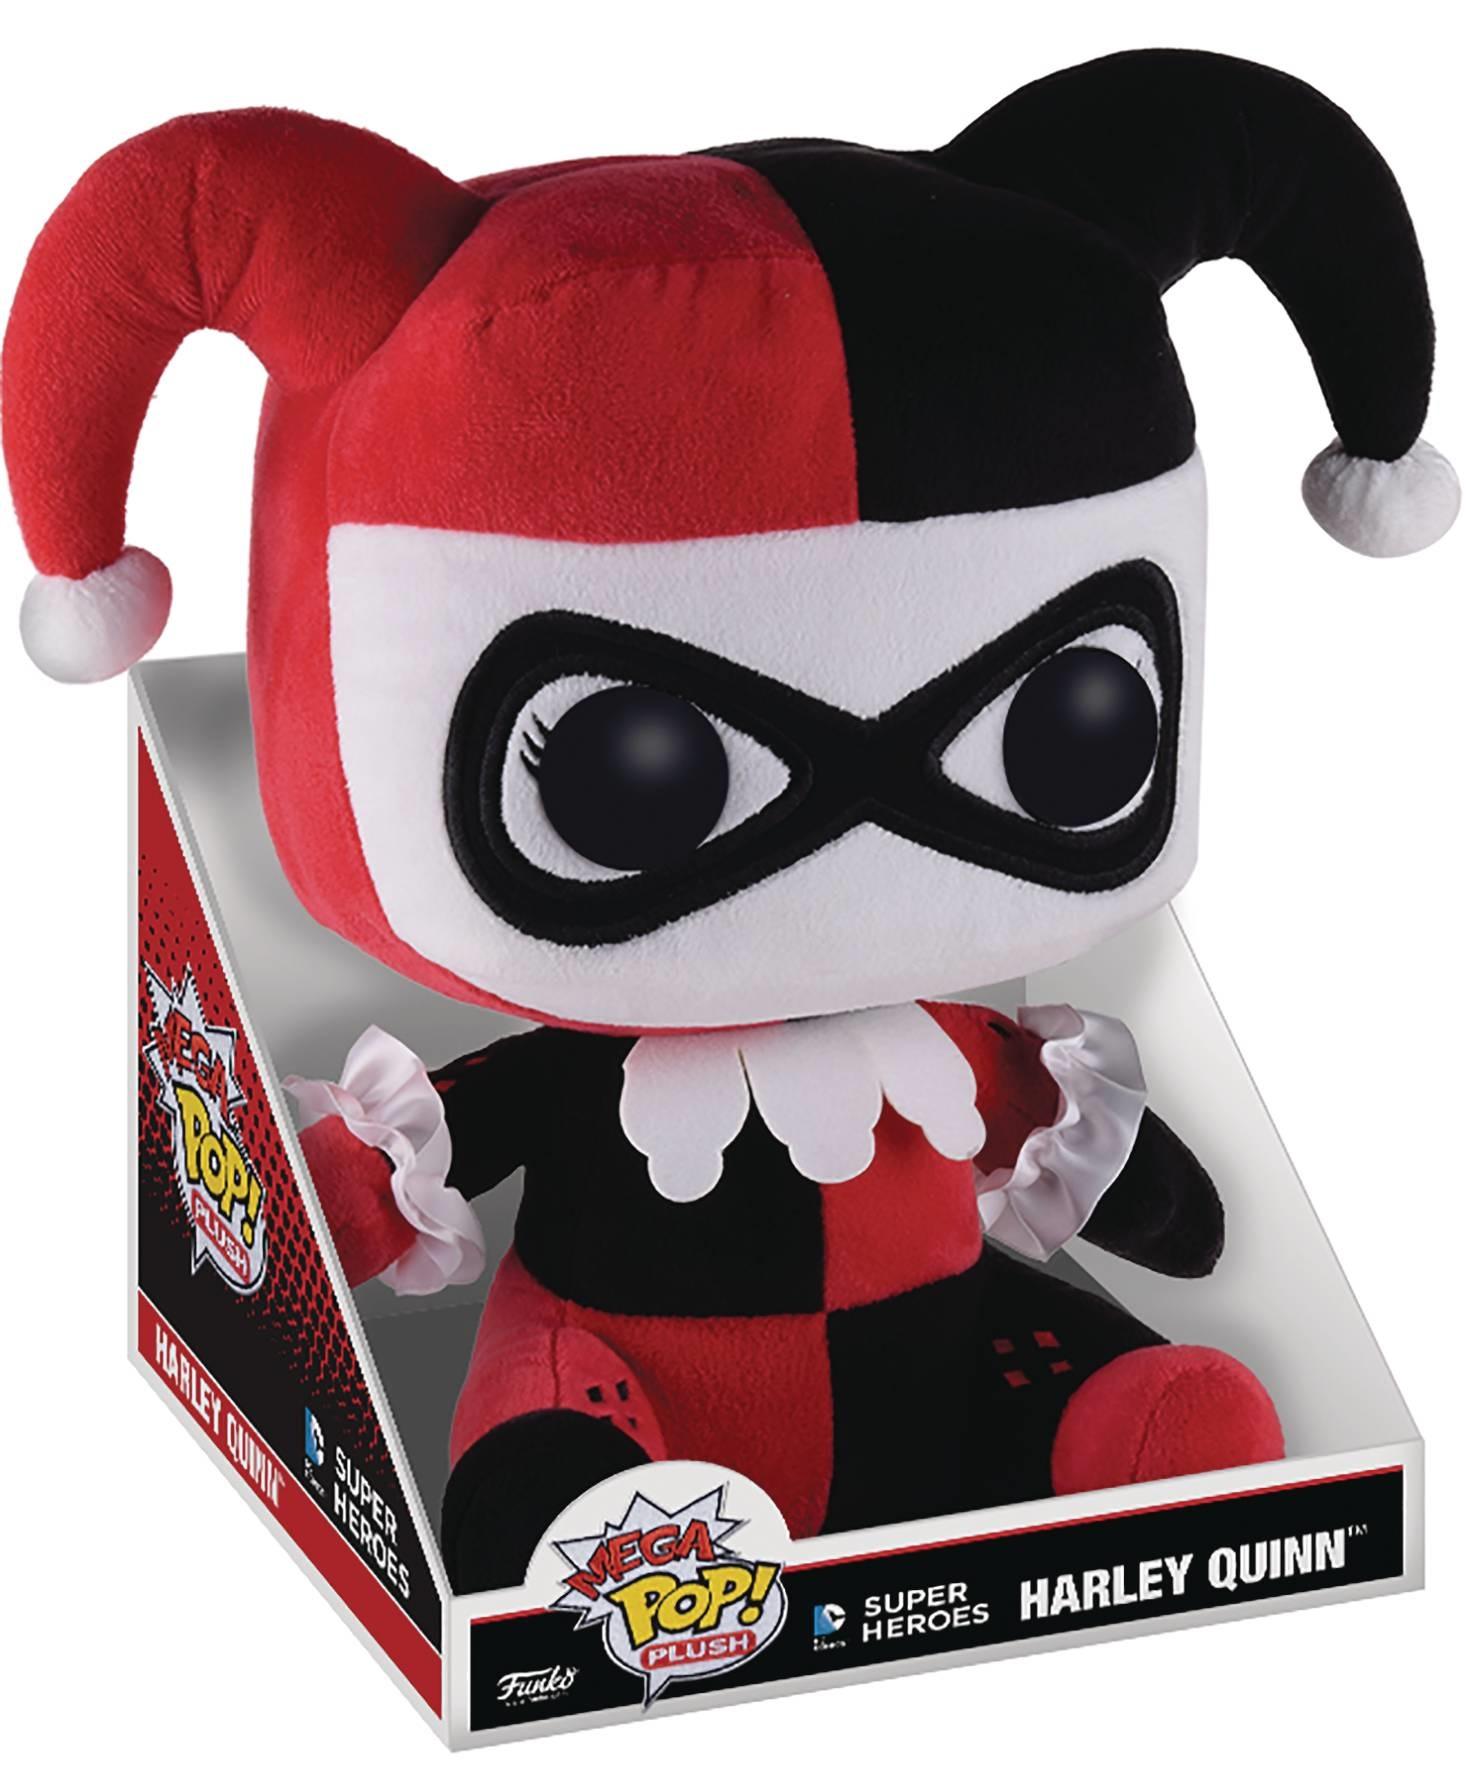 Harley Quinn 16 Jumbo Pop Plush